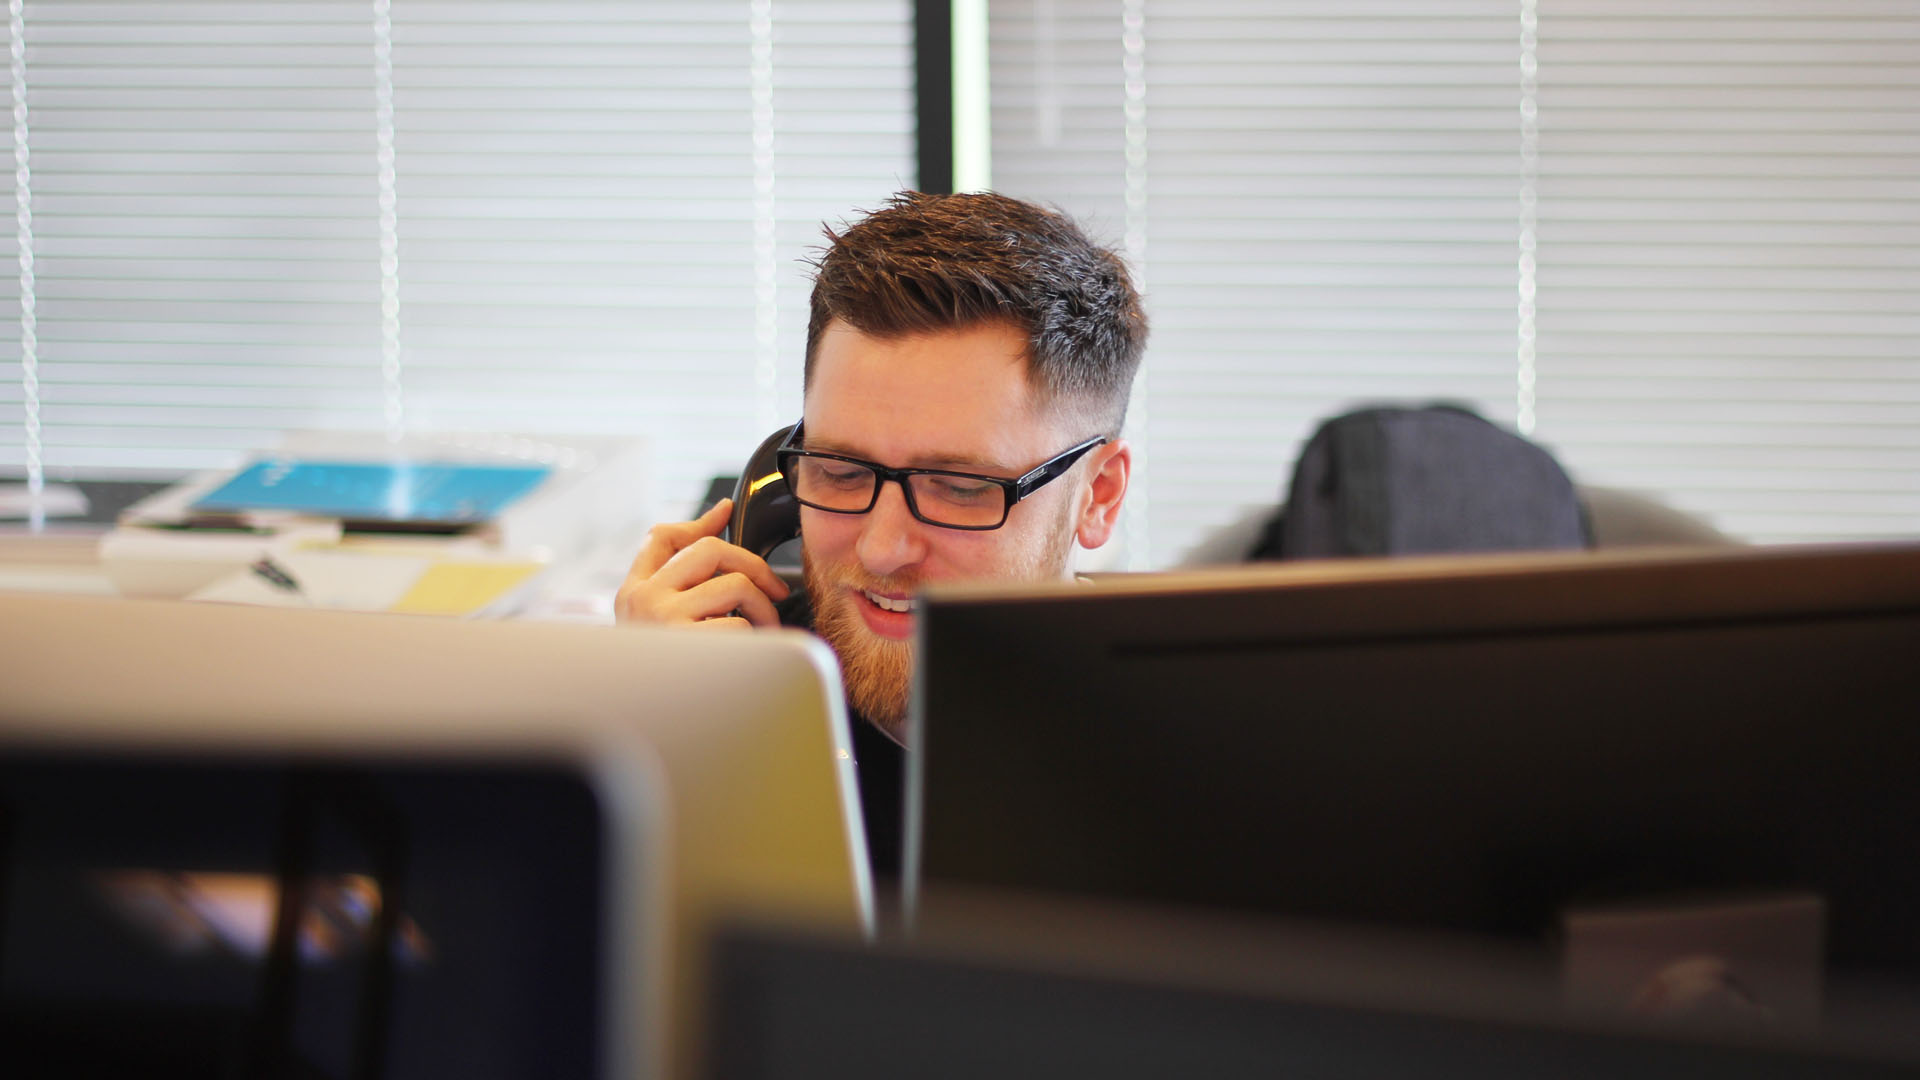 Il b2b dovrebbe affidarsi ai call center o all'inbound marketing